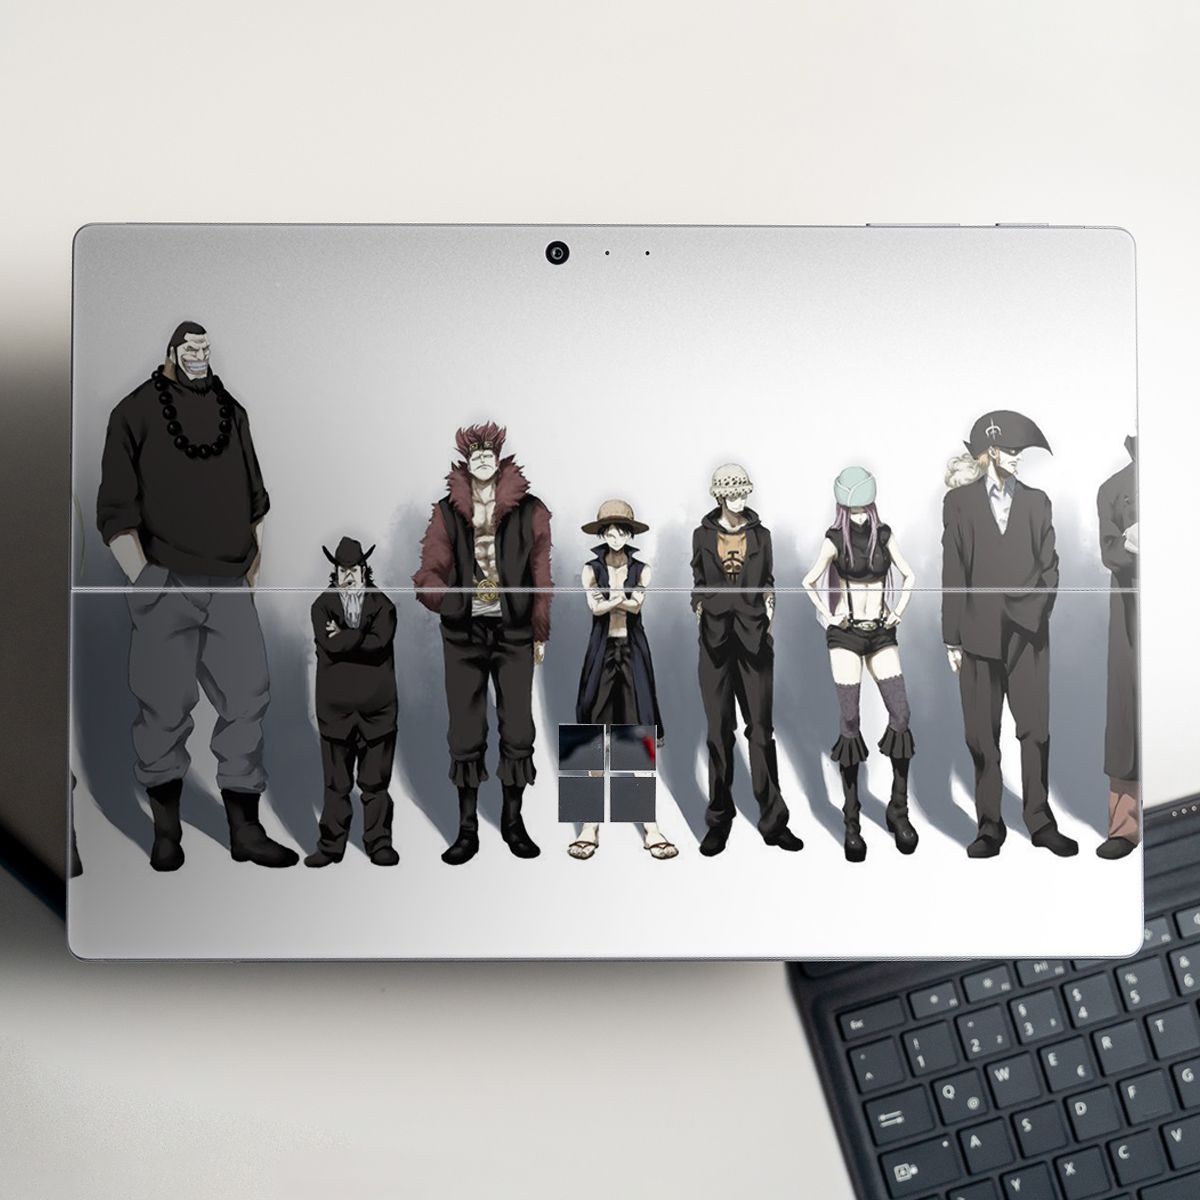 Skin dán hình One Piece x16 cho Surface Go, Pro 2, Pro 3, Pro 4, Pro 5, Pro 6, Pro 7, Pro X